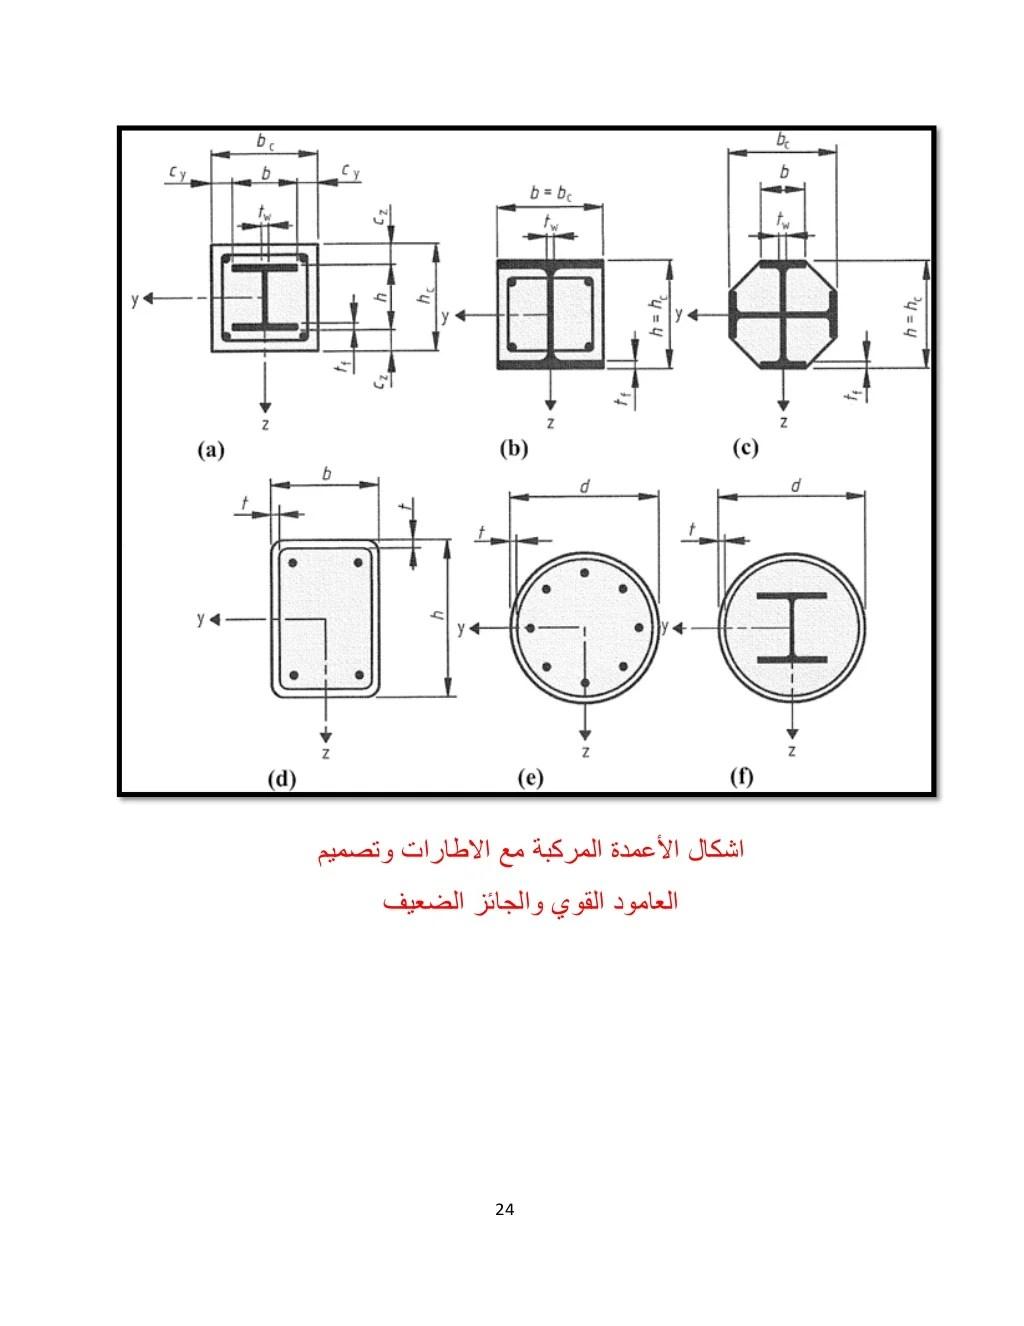 seismic-design-of-composite-shear-walls-frames-24-1024.jpg